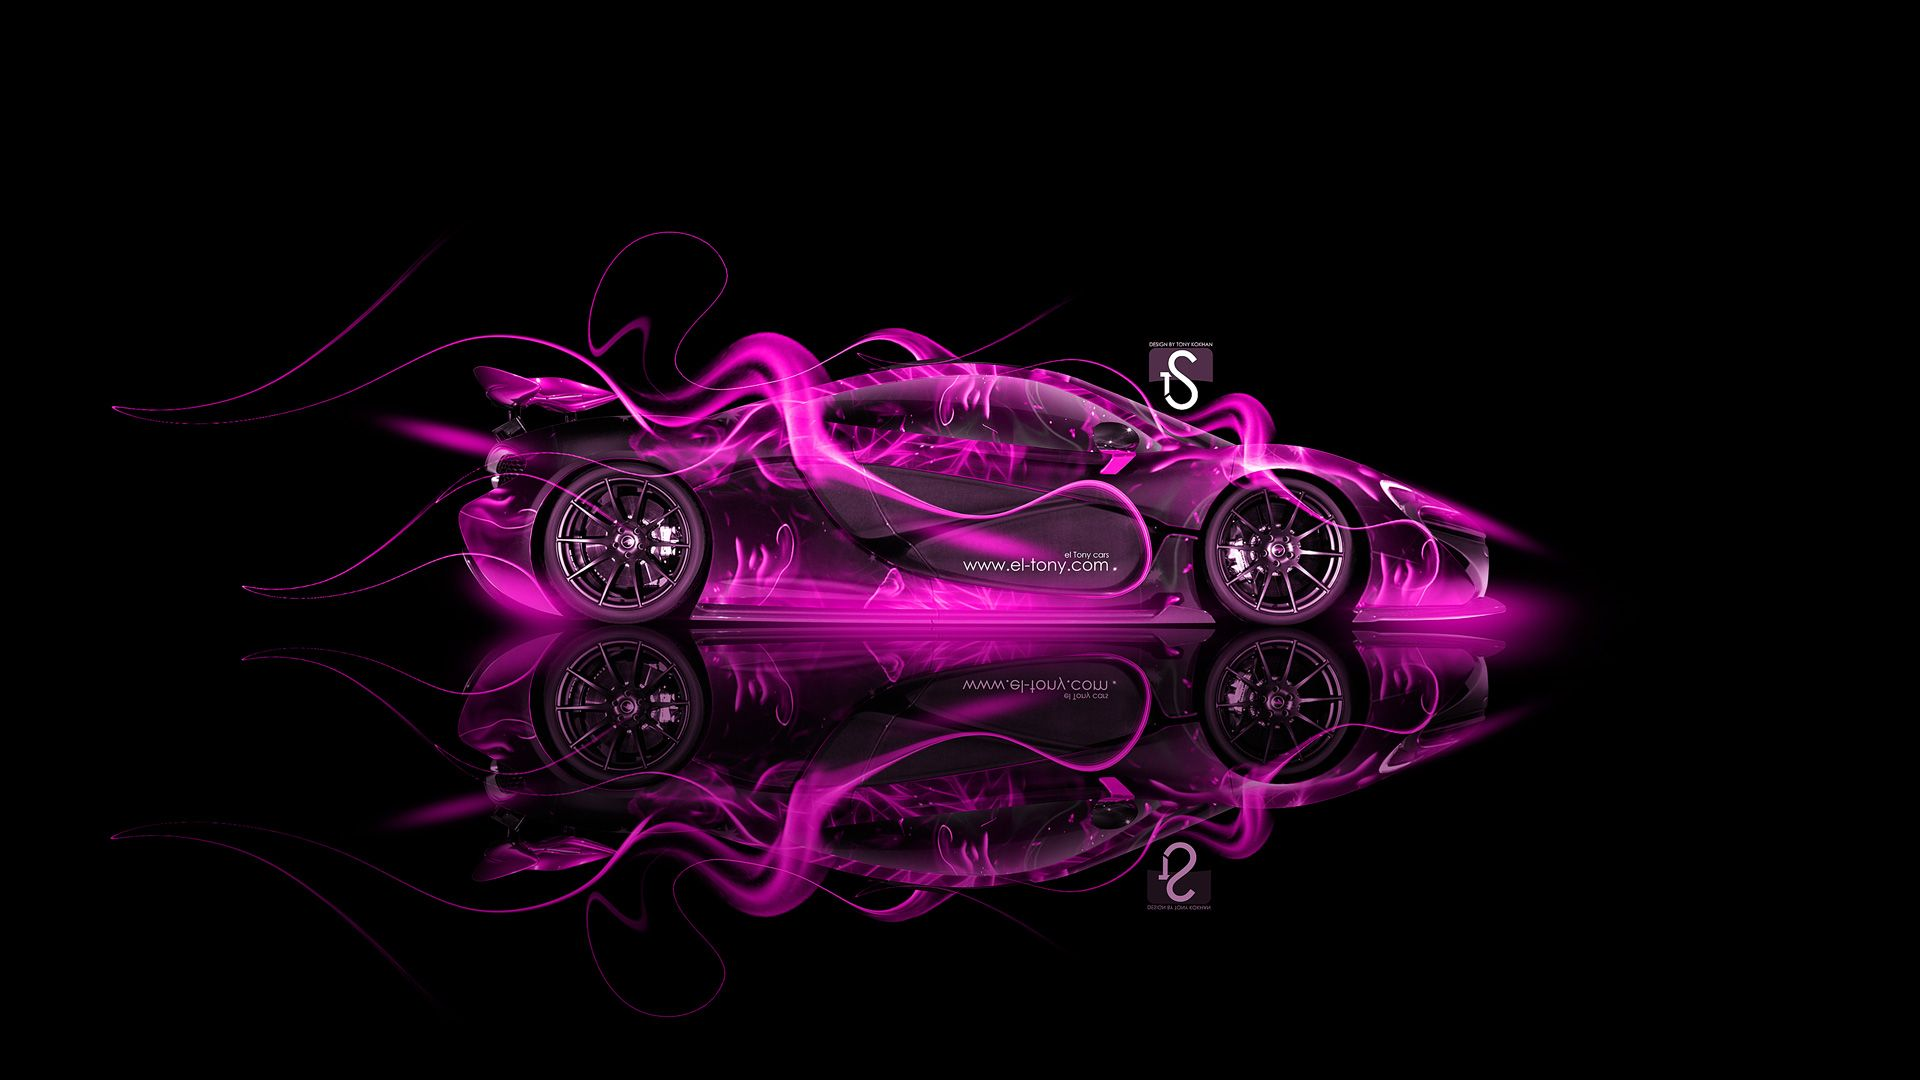 Attirant McLaren P1 Fire Abstract Car 2013